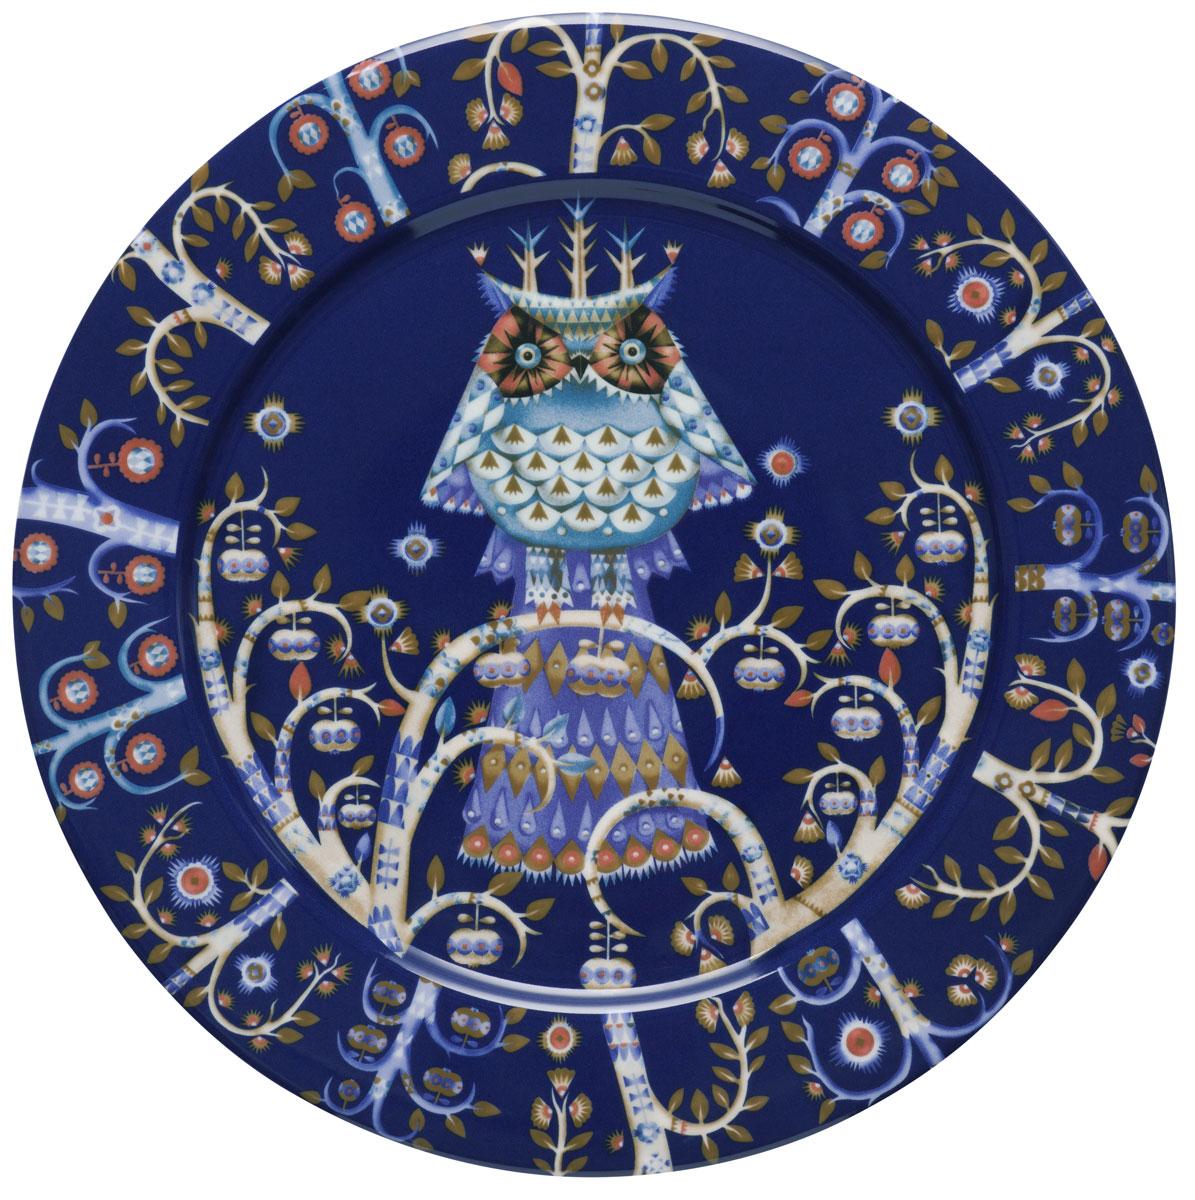 Тарелка Iittala Taika, цвет: синий, диаметр 27 см1011635